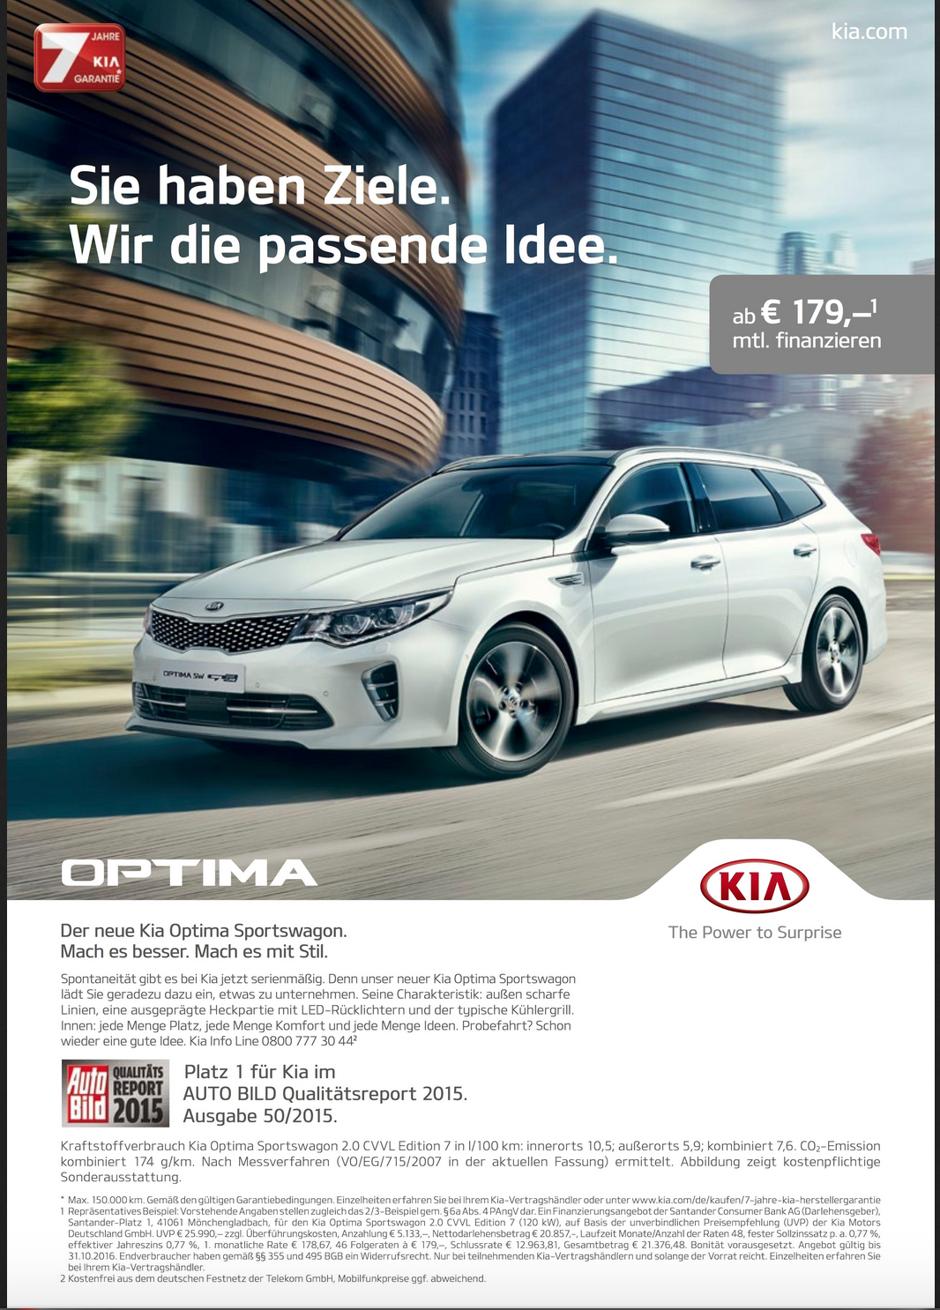 Fein Kia Optima Funkschaltplan Ideen - Der Schaltplan - triangre.info